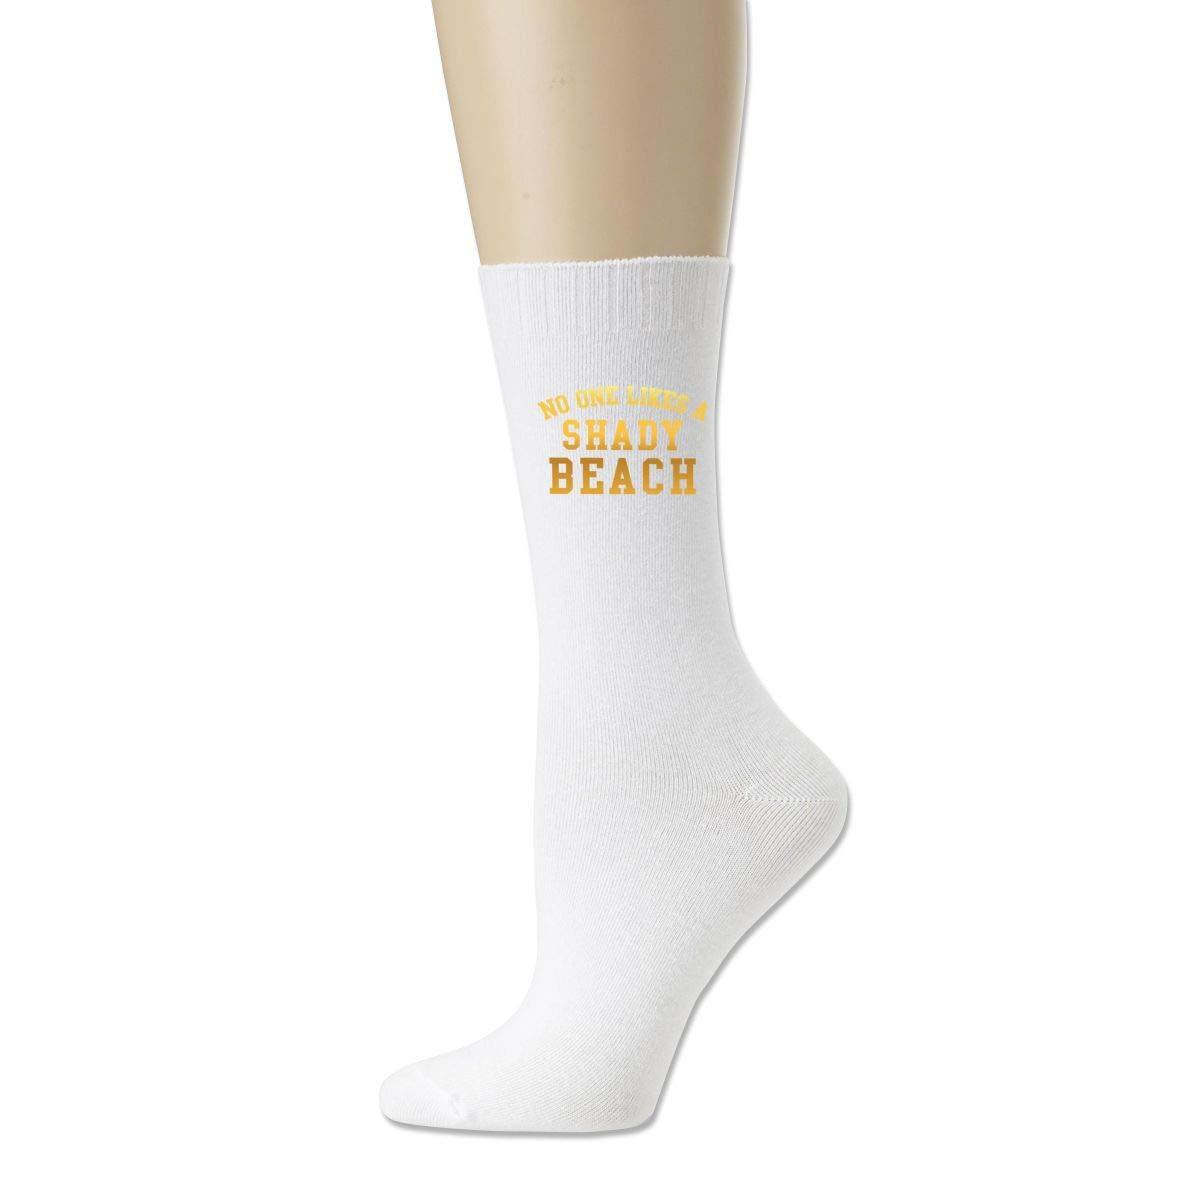 No One Like A Shady Beach Cotton Solid Socks For Womens/' Socks